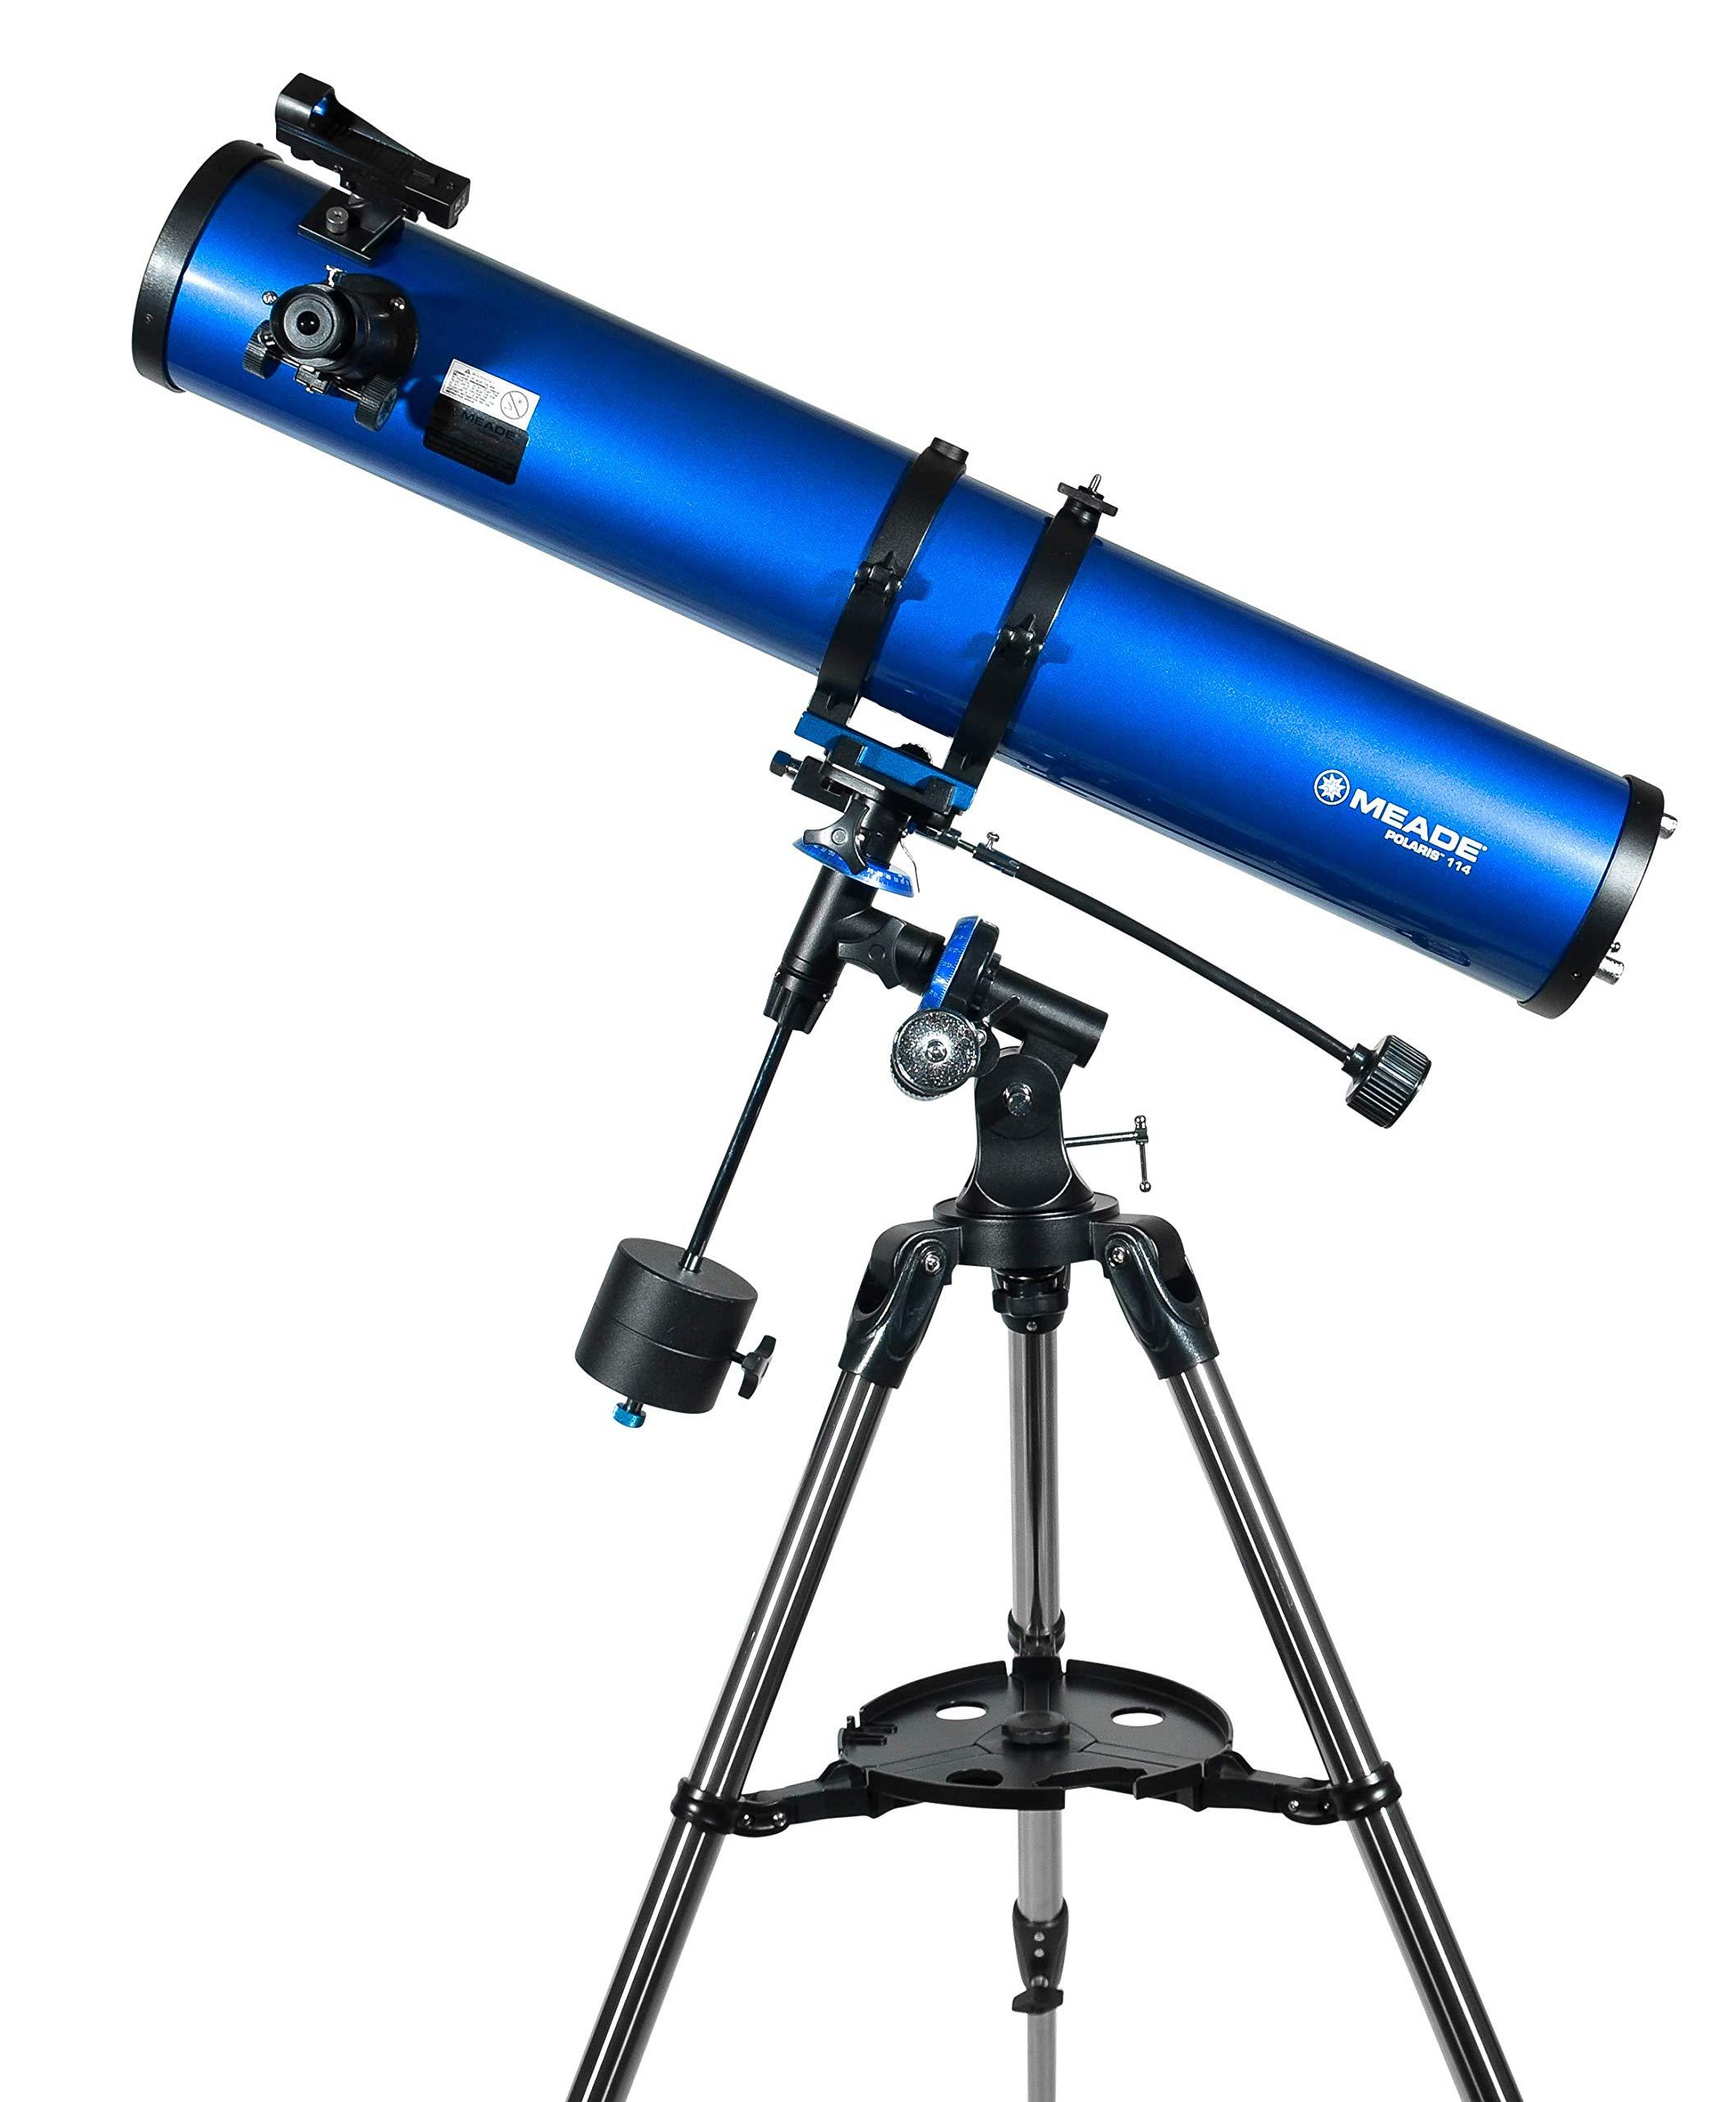 Meade Instruments 216004 Polaris 114 EQ Reflector Telescope (Blue) by Meade Instruments